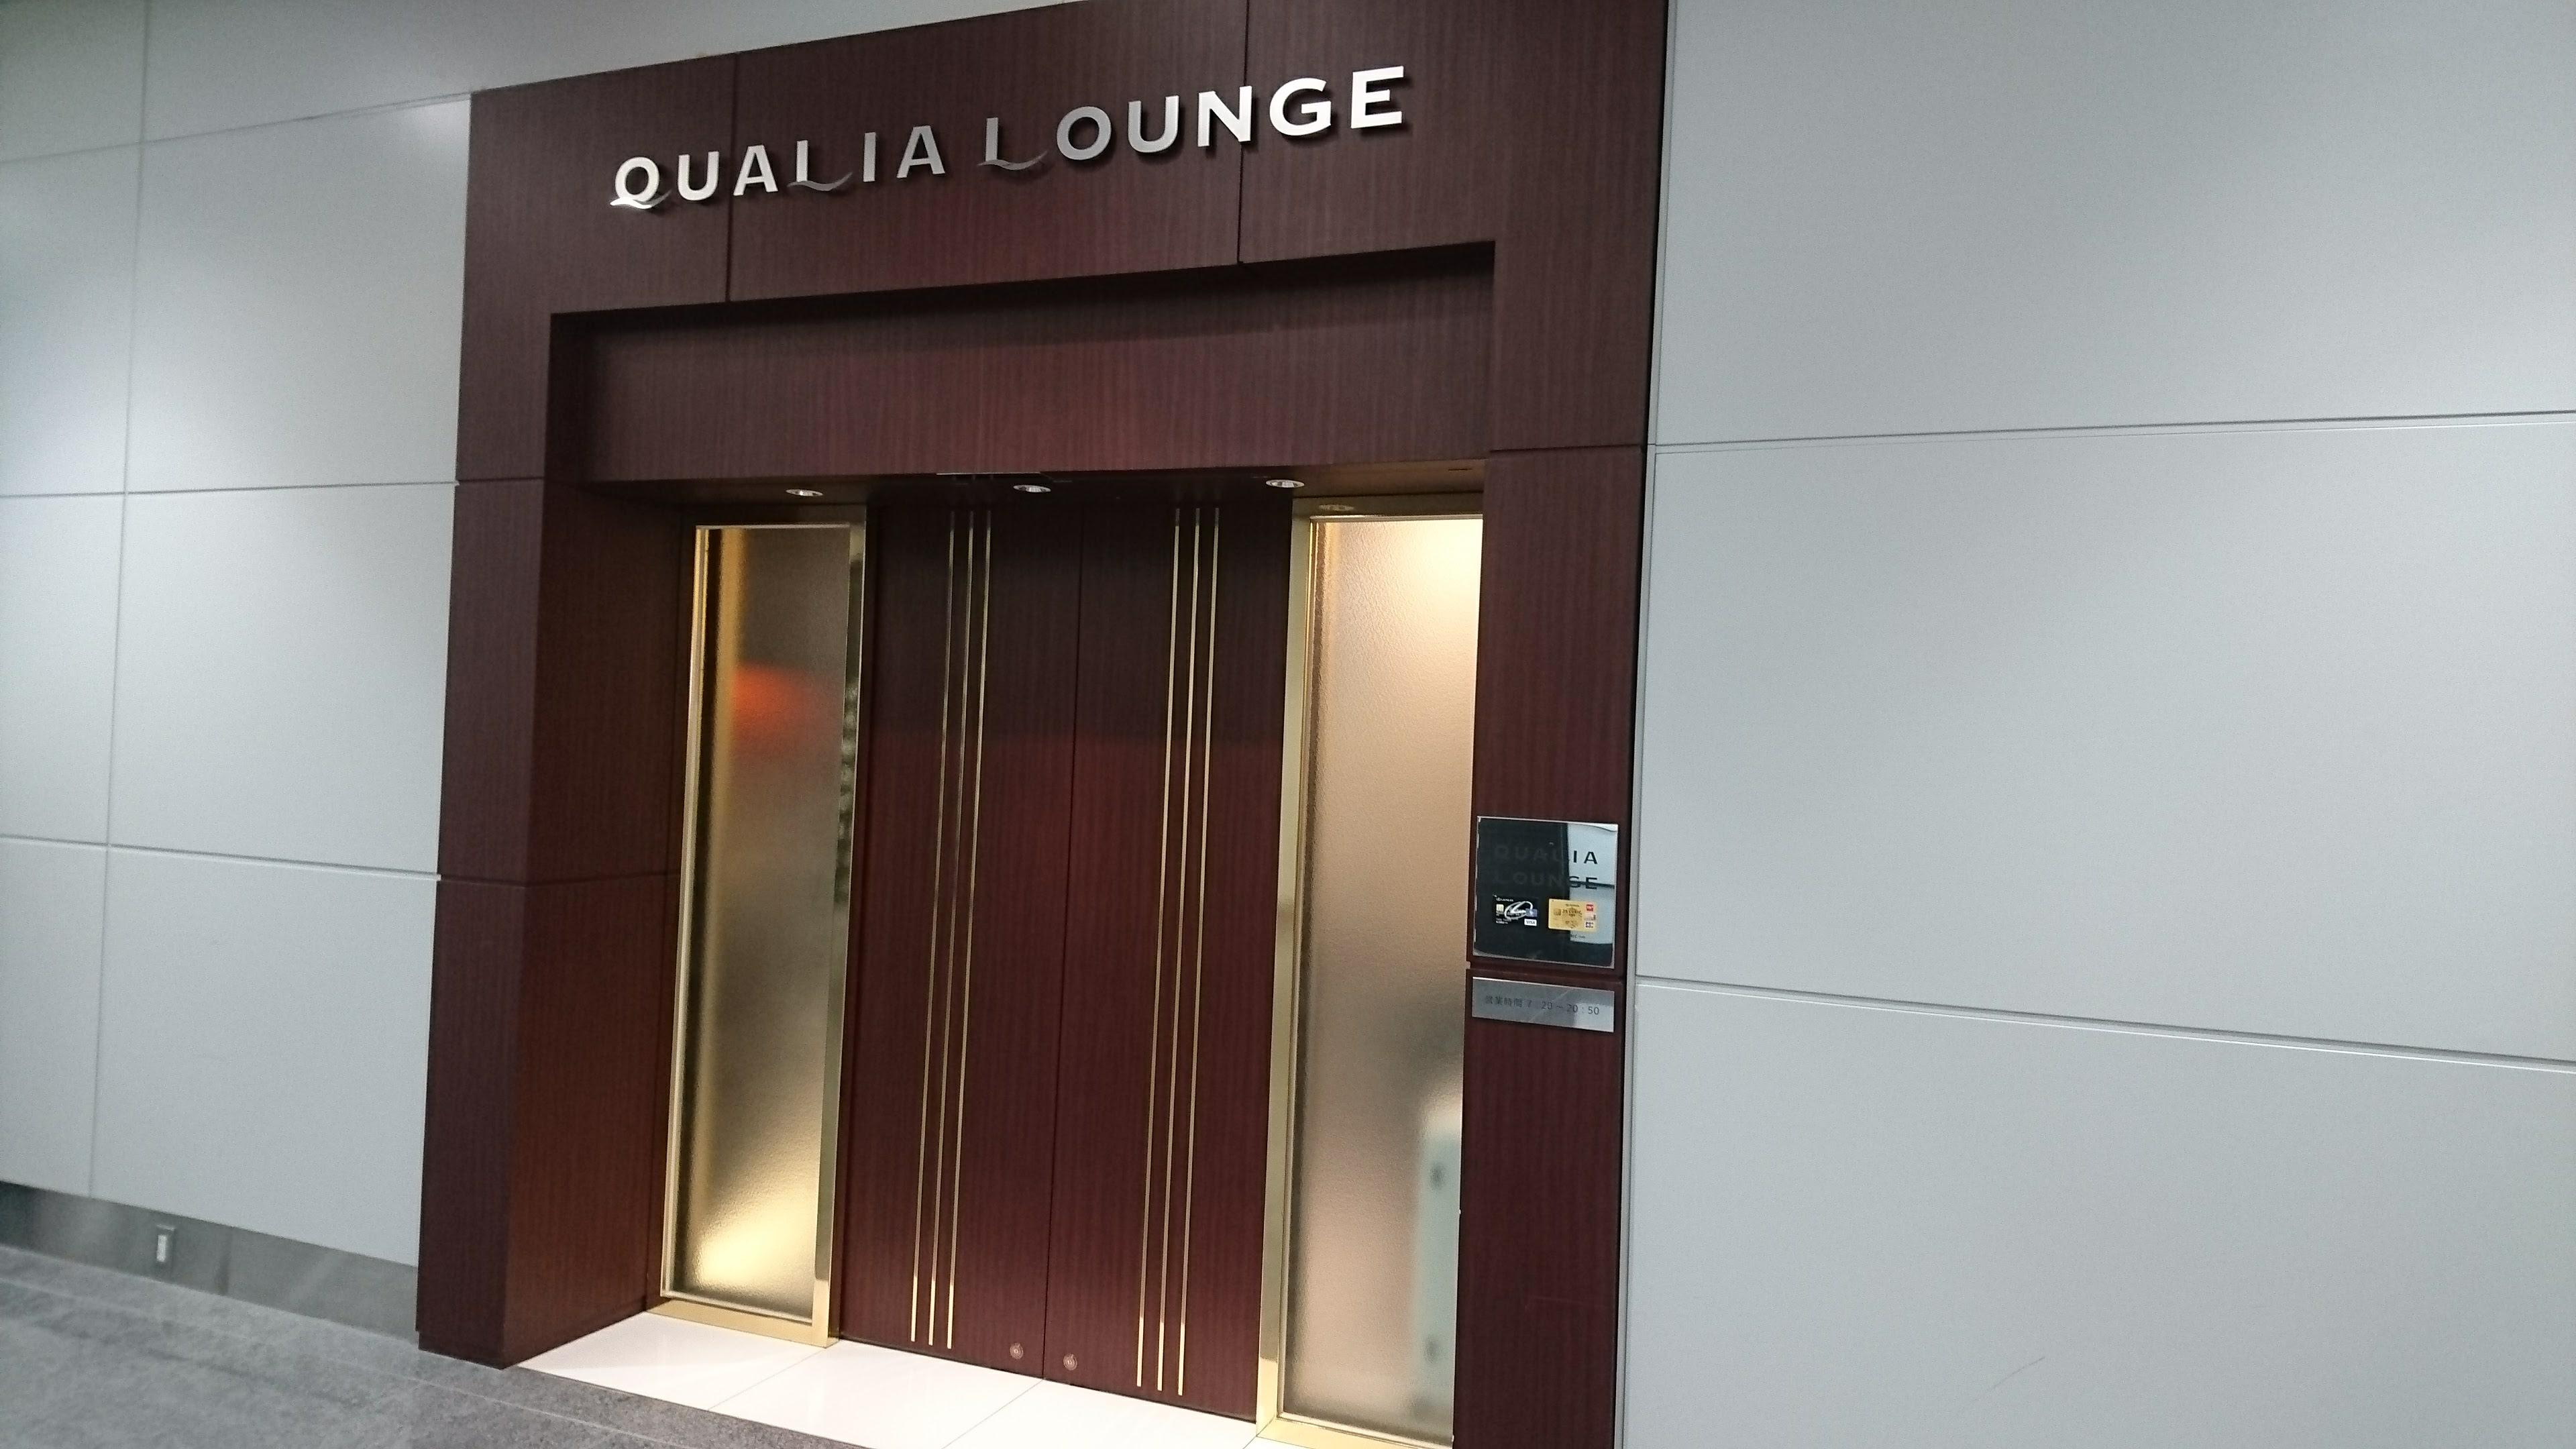 lounge_ngo_domestic_qualia_001